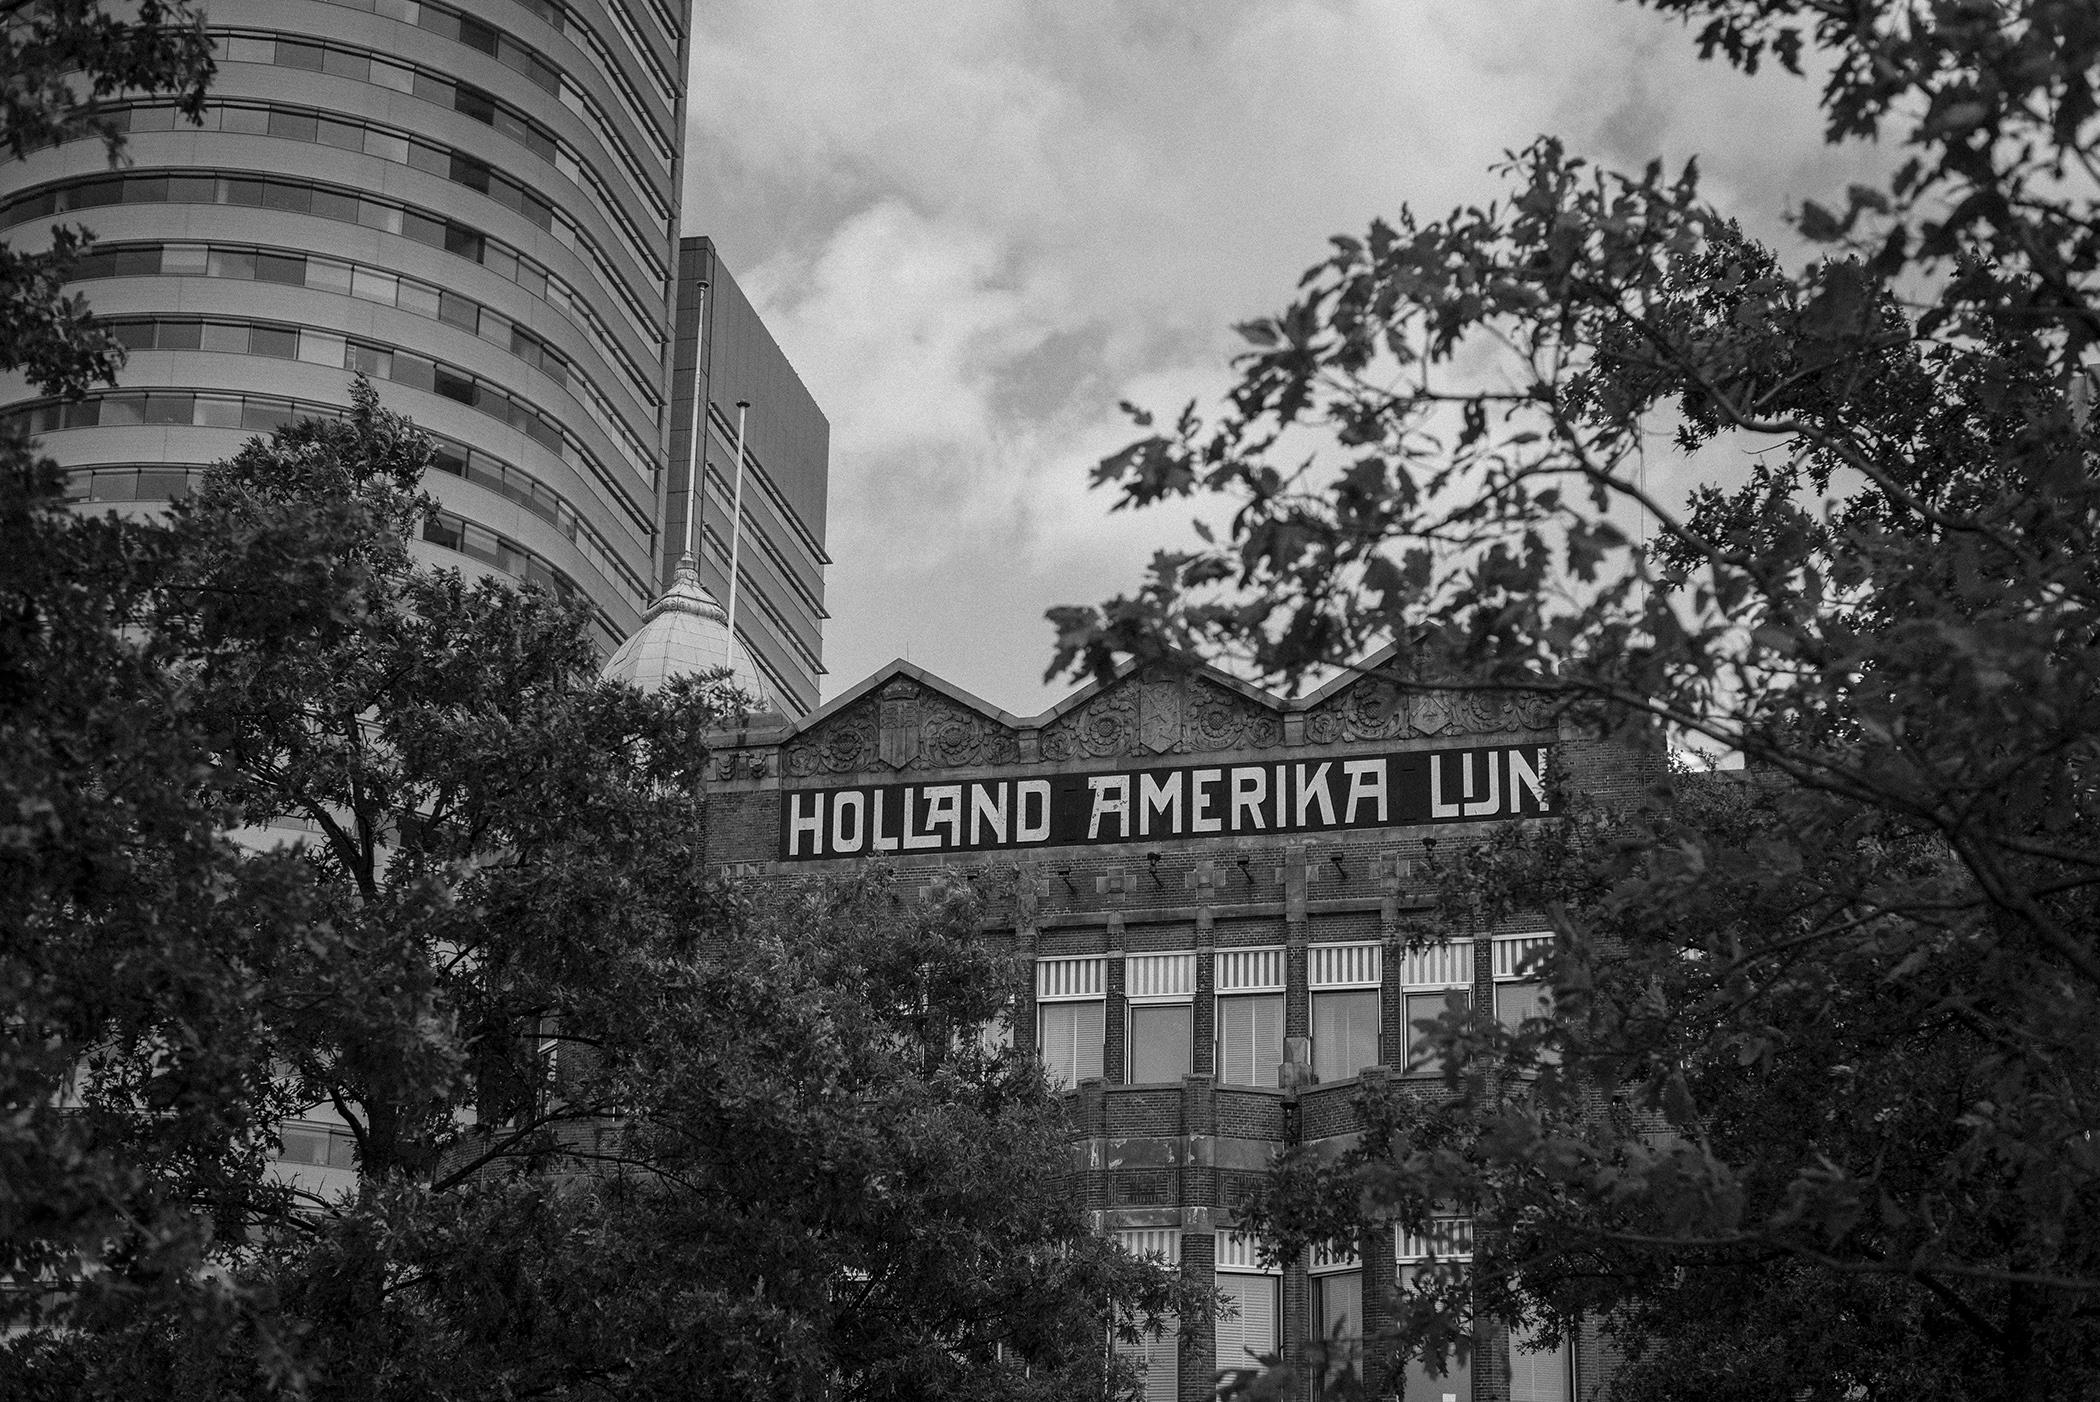 Rotterdam Holland America Lijn bnw street photography